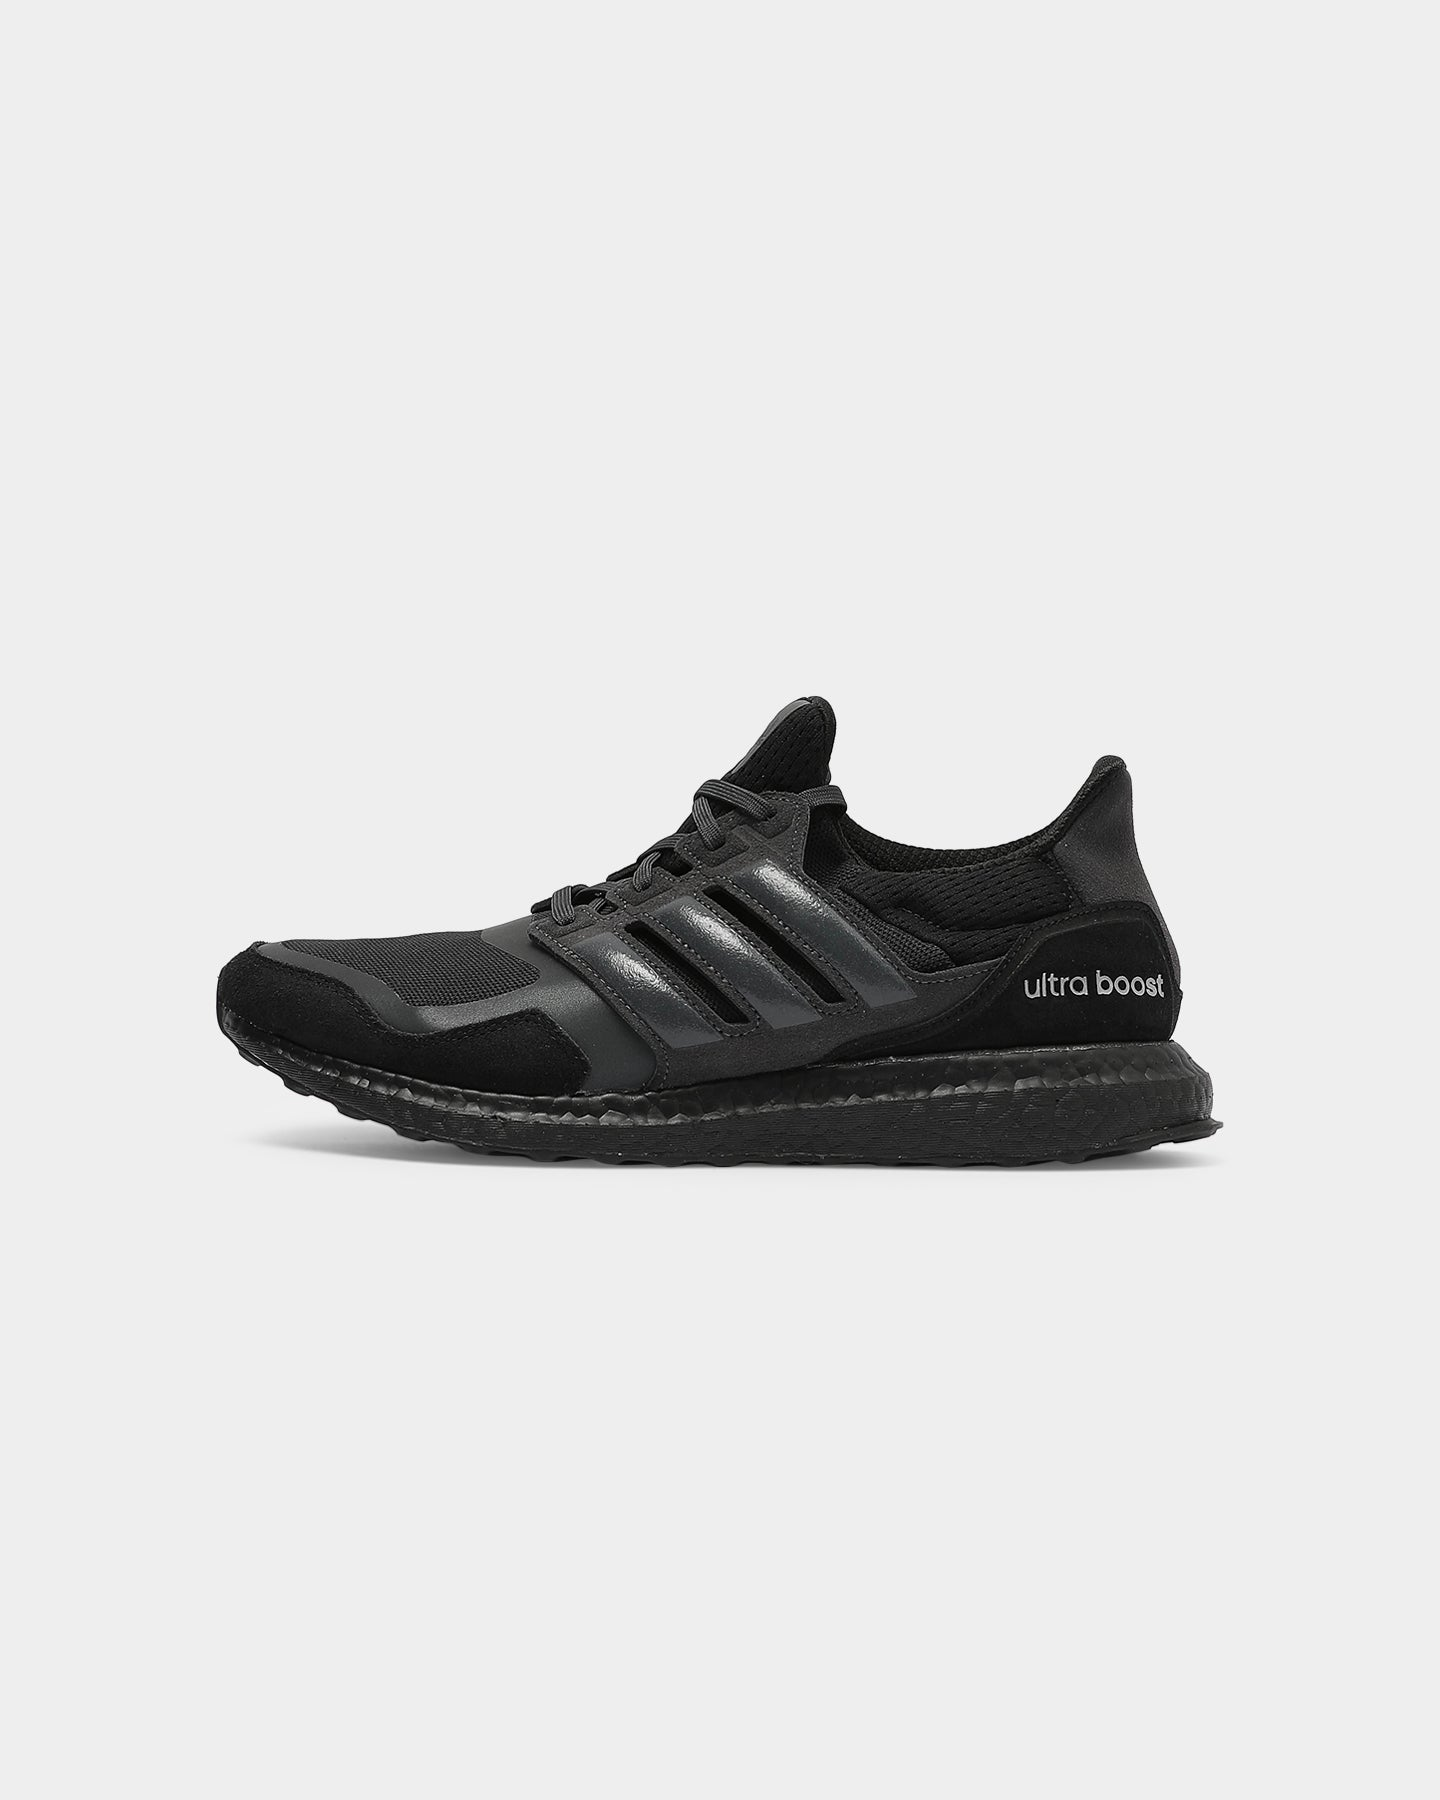 Adidas Ultraboost S&L BlackCarbonLight Grey